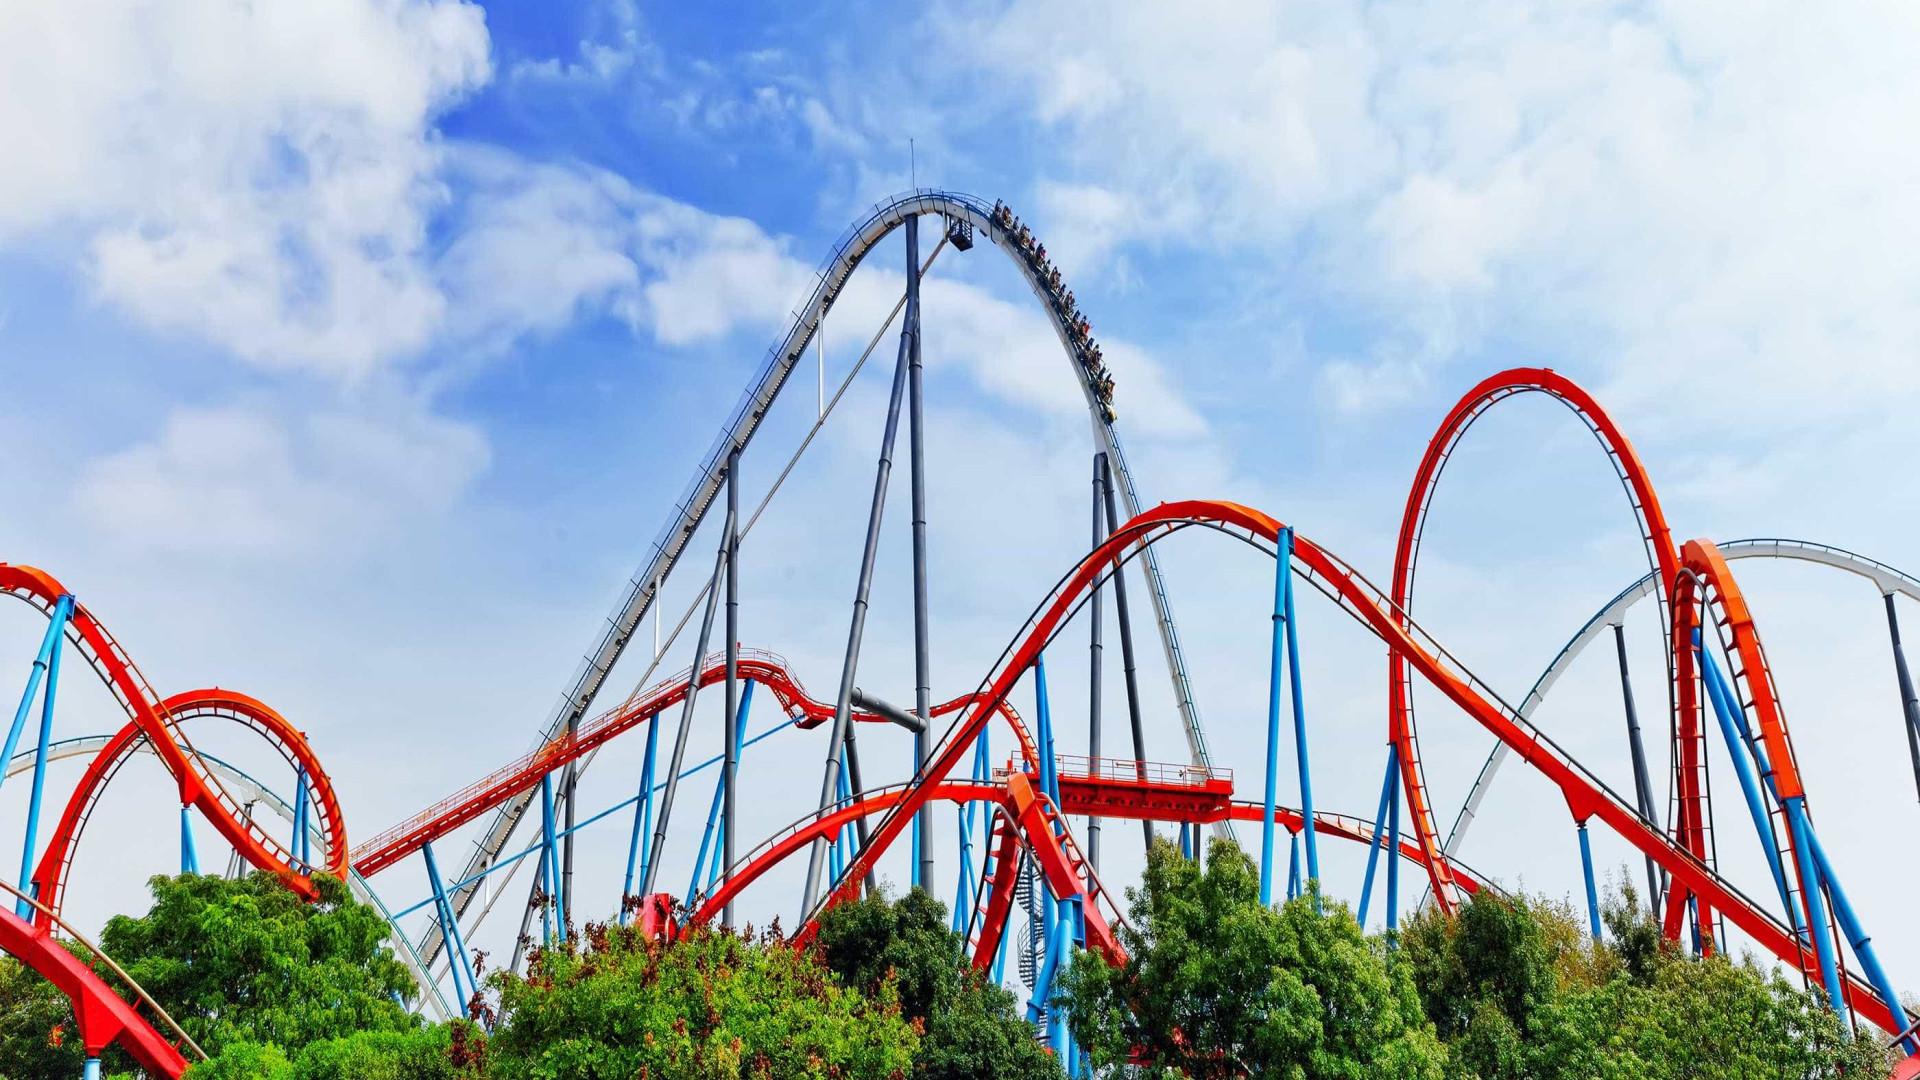 Disneyland com concorrência na Europa. Vem aí o 'Paramount Pictures Land'